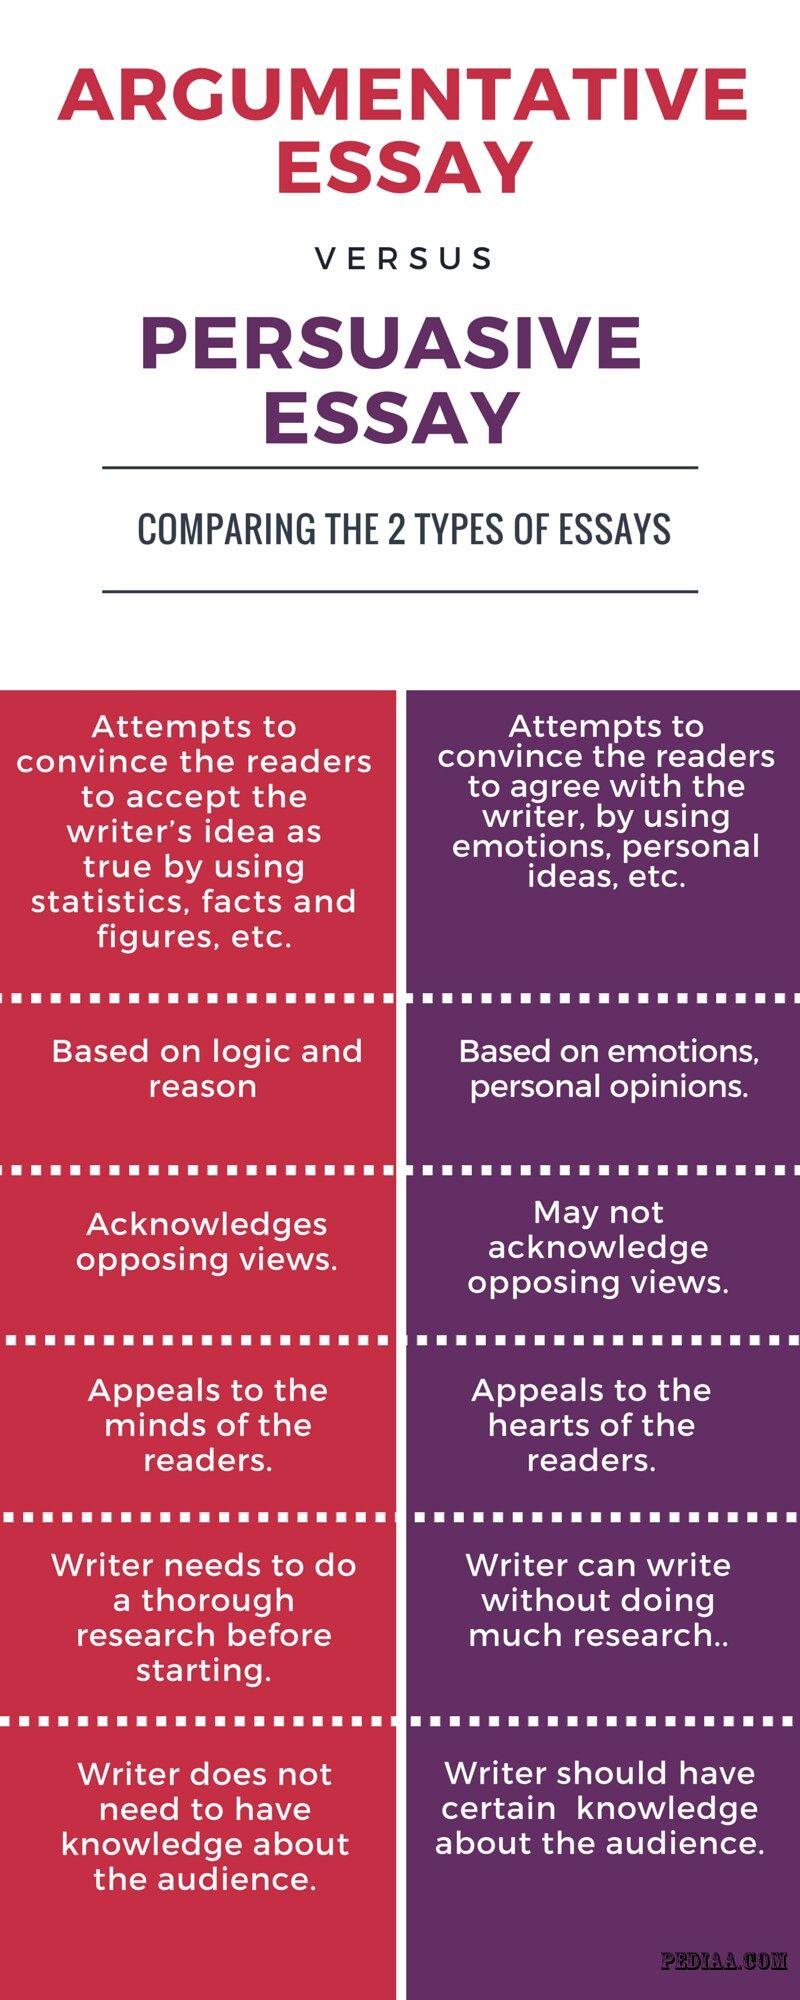 In A Persuasive Essay Develop Your Argument✏️ • Best blogger.com👨🎓